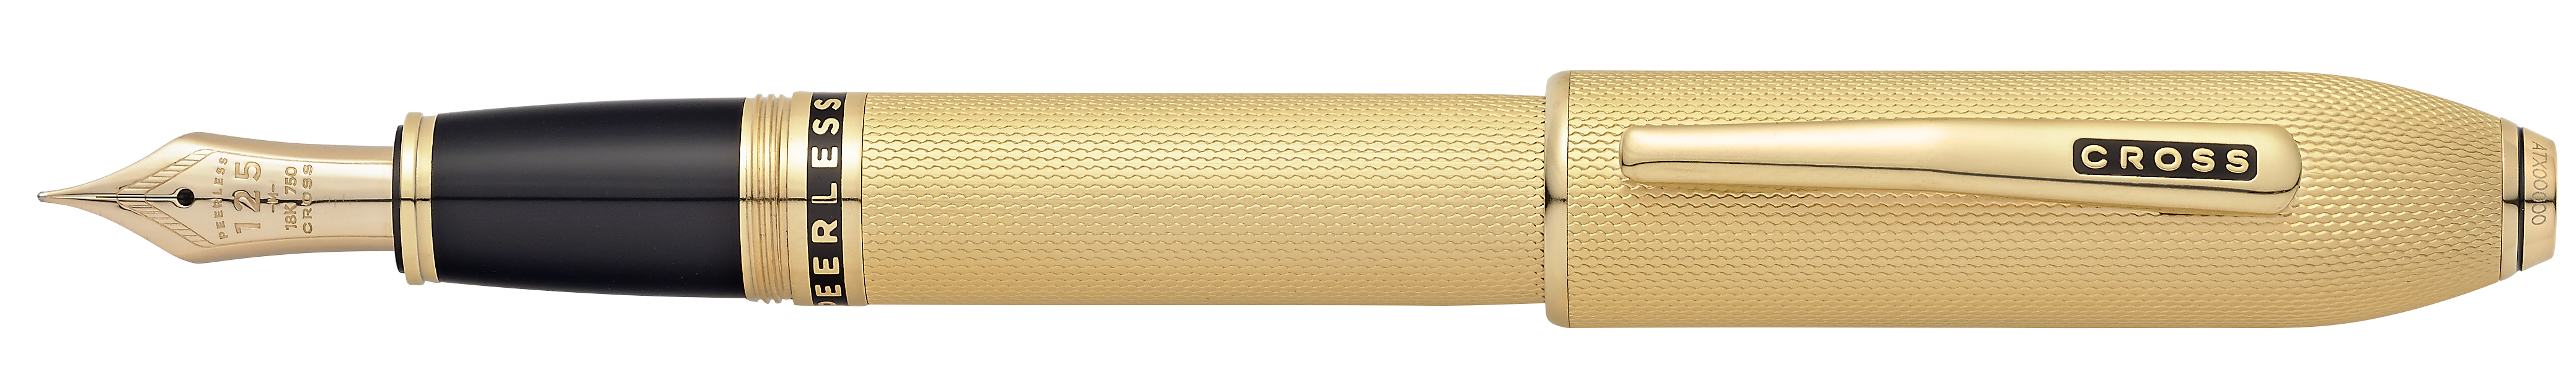 Peerless 125 23KT Gold Plated Fountain Pen